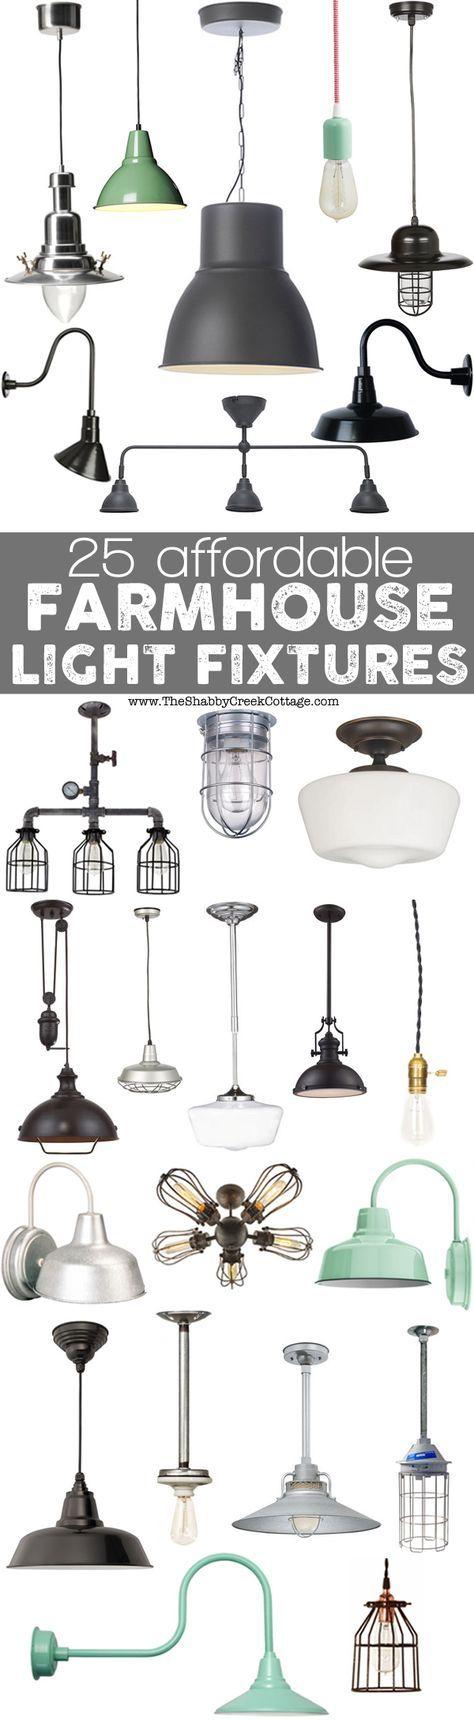 Lamp used bathroom faucets - Best 25 Rustic Light Fixtures Ideas On Pinterest Southwestern Post Lights Modern Post Lights And Southwestern Kitchen Fixtures